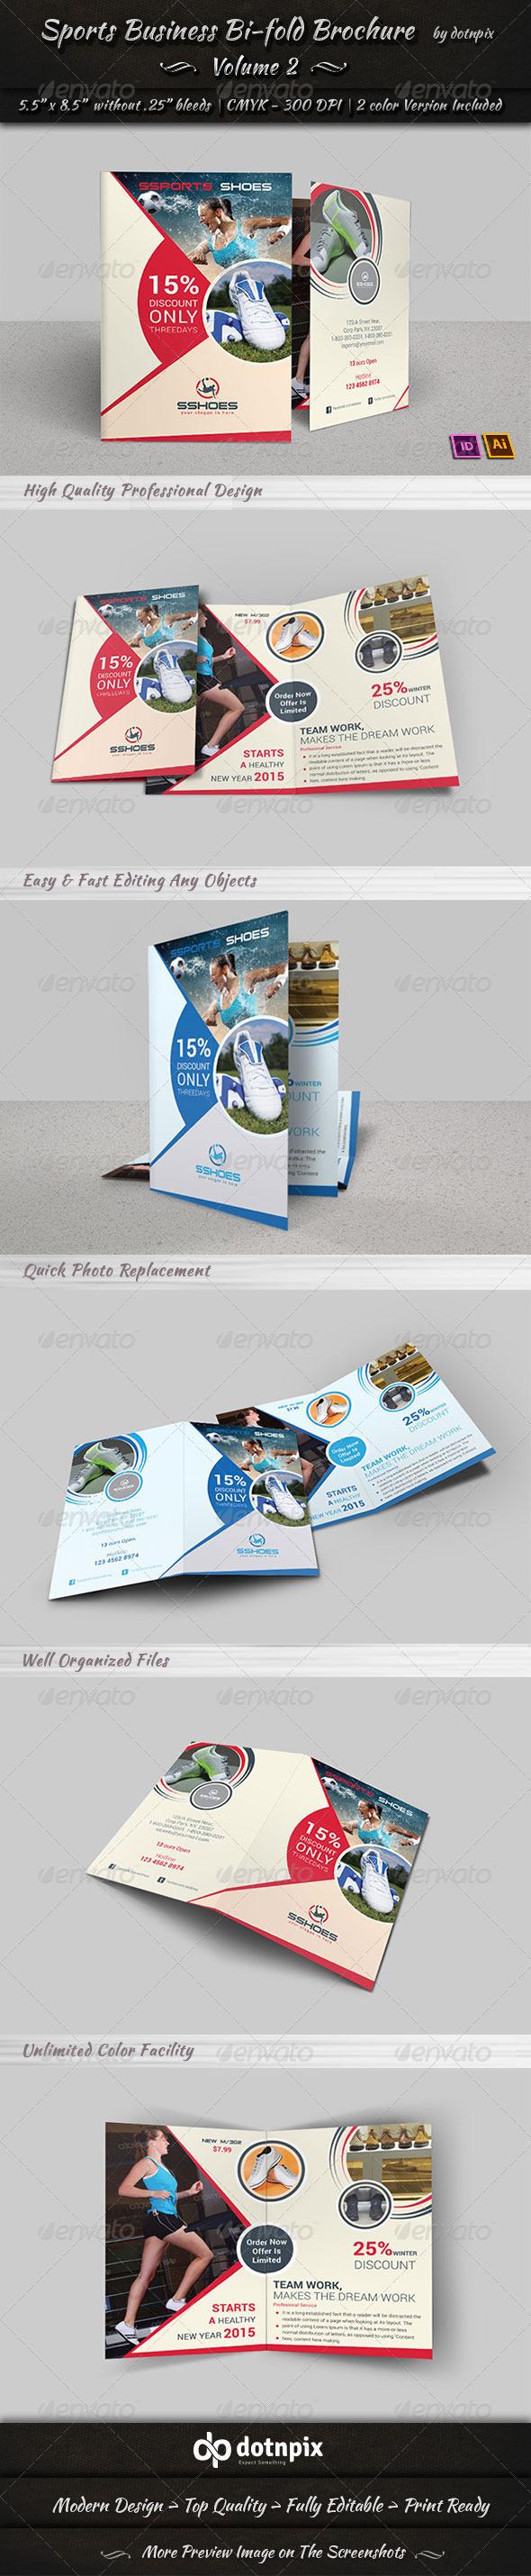 Sports Business Bi-Fold Brochure | Volume 2 - Corporate Brochures